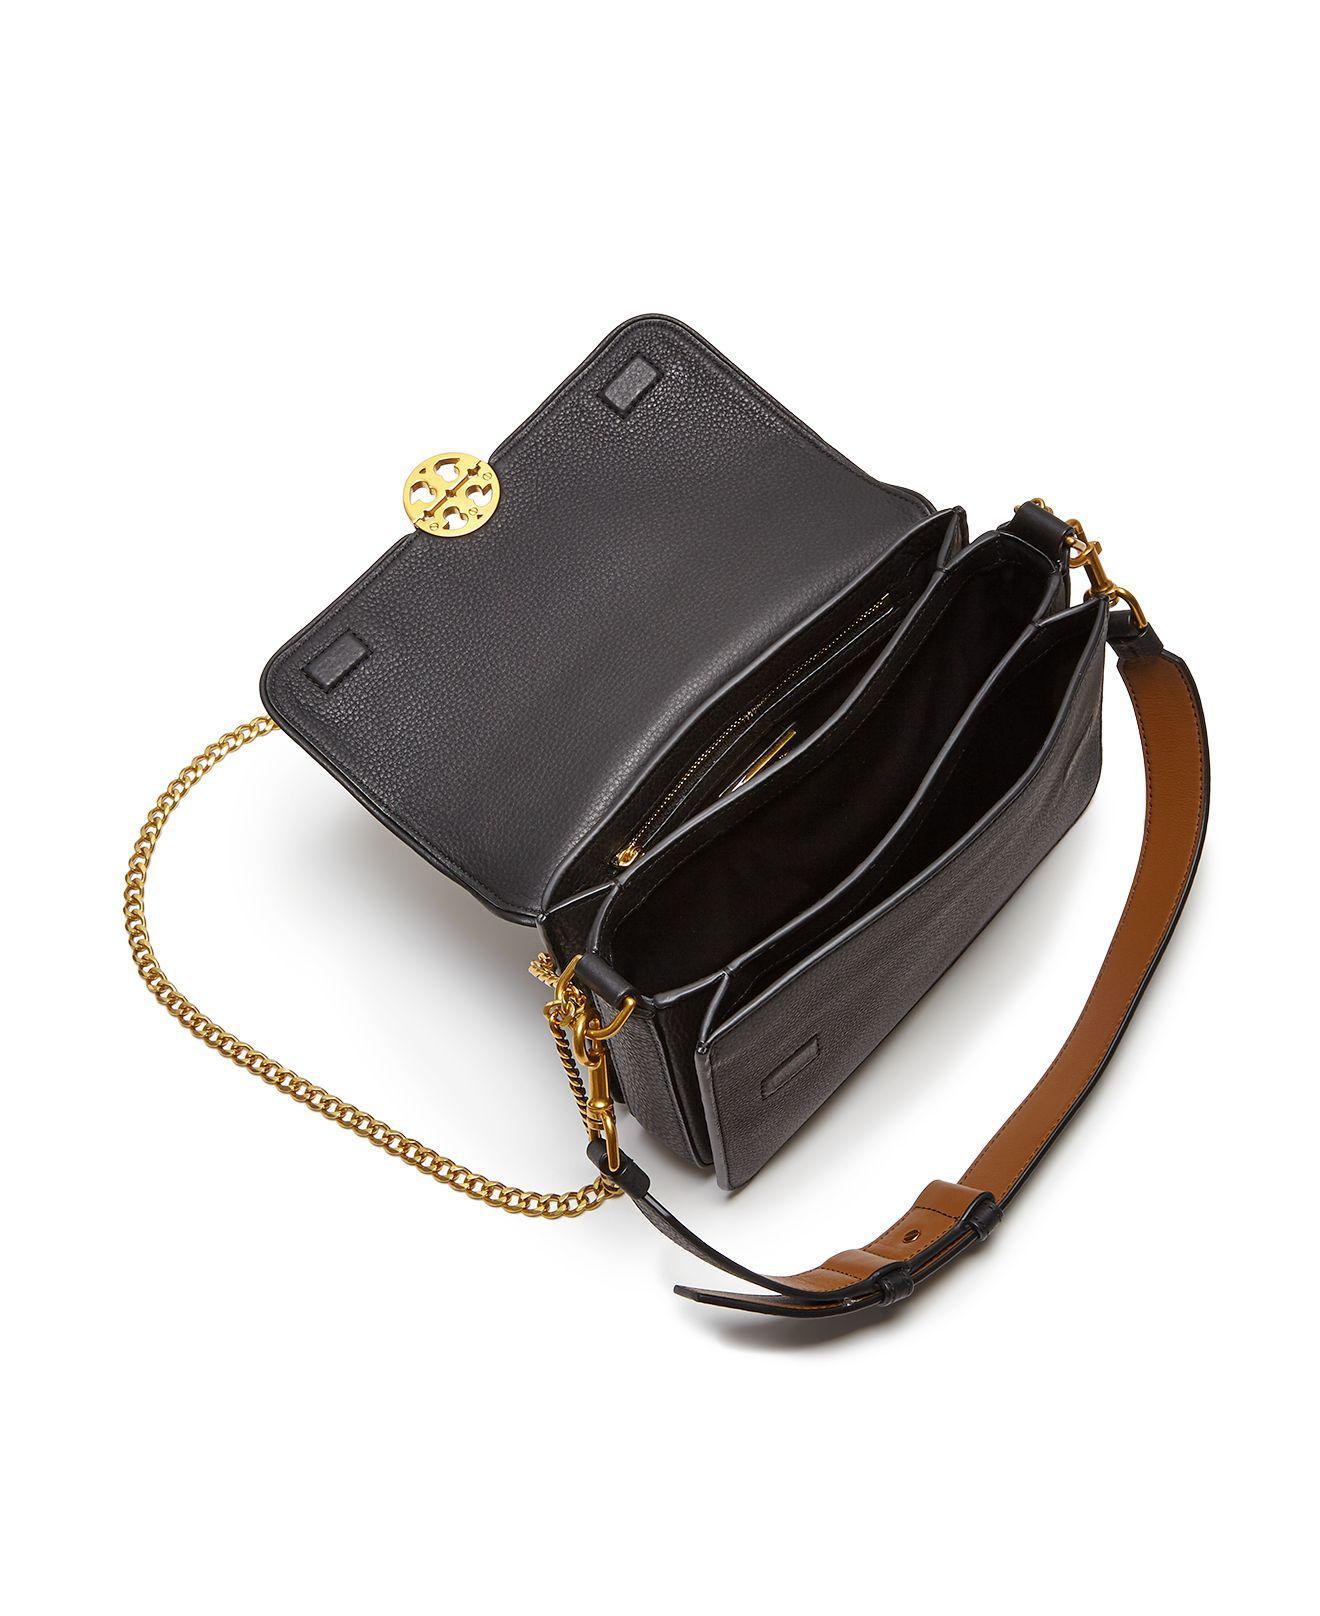 1e8903d33b4 Tory Burch - Multicolor Chelsea Convertible Shoulder Bag - Lyst